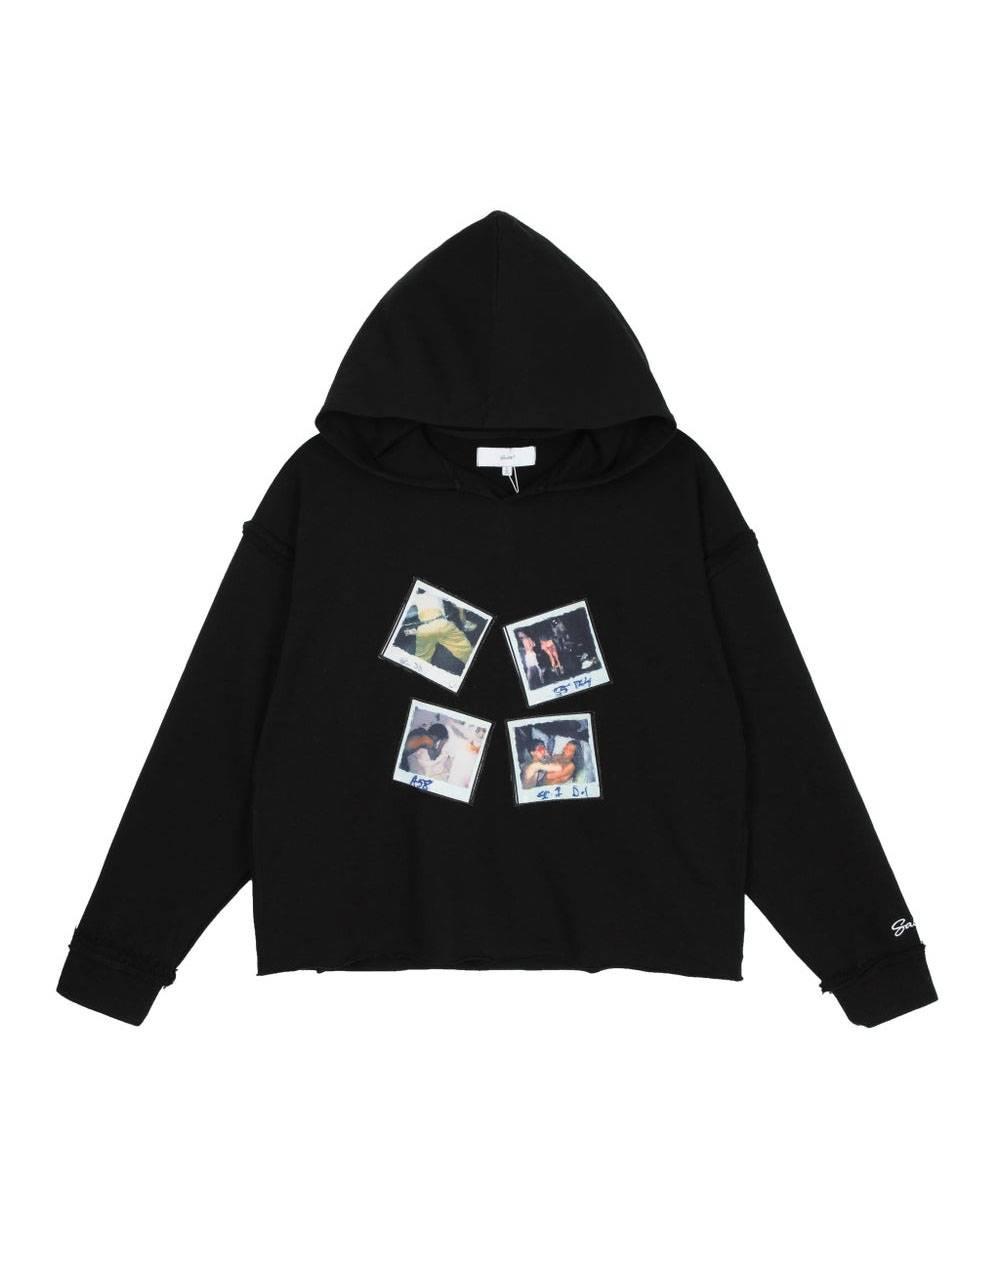 Salute HK Polaroid box fit cropped hoodie - black Salute HK Sweater 114,75€